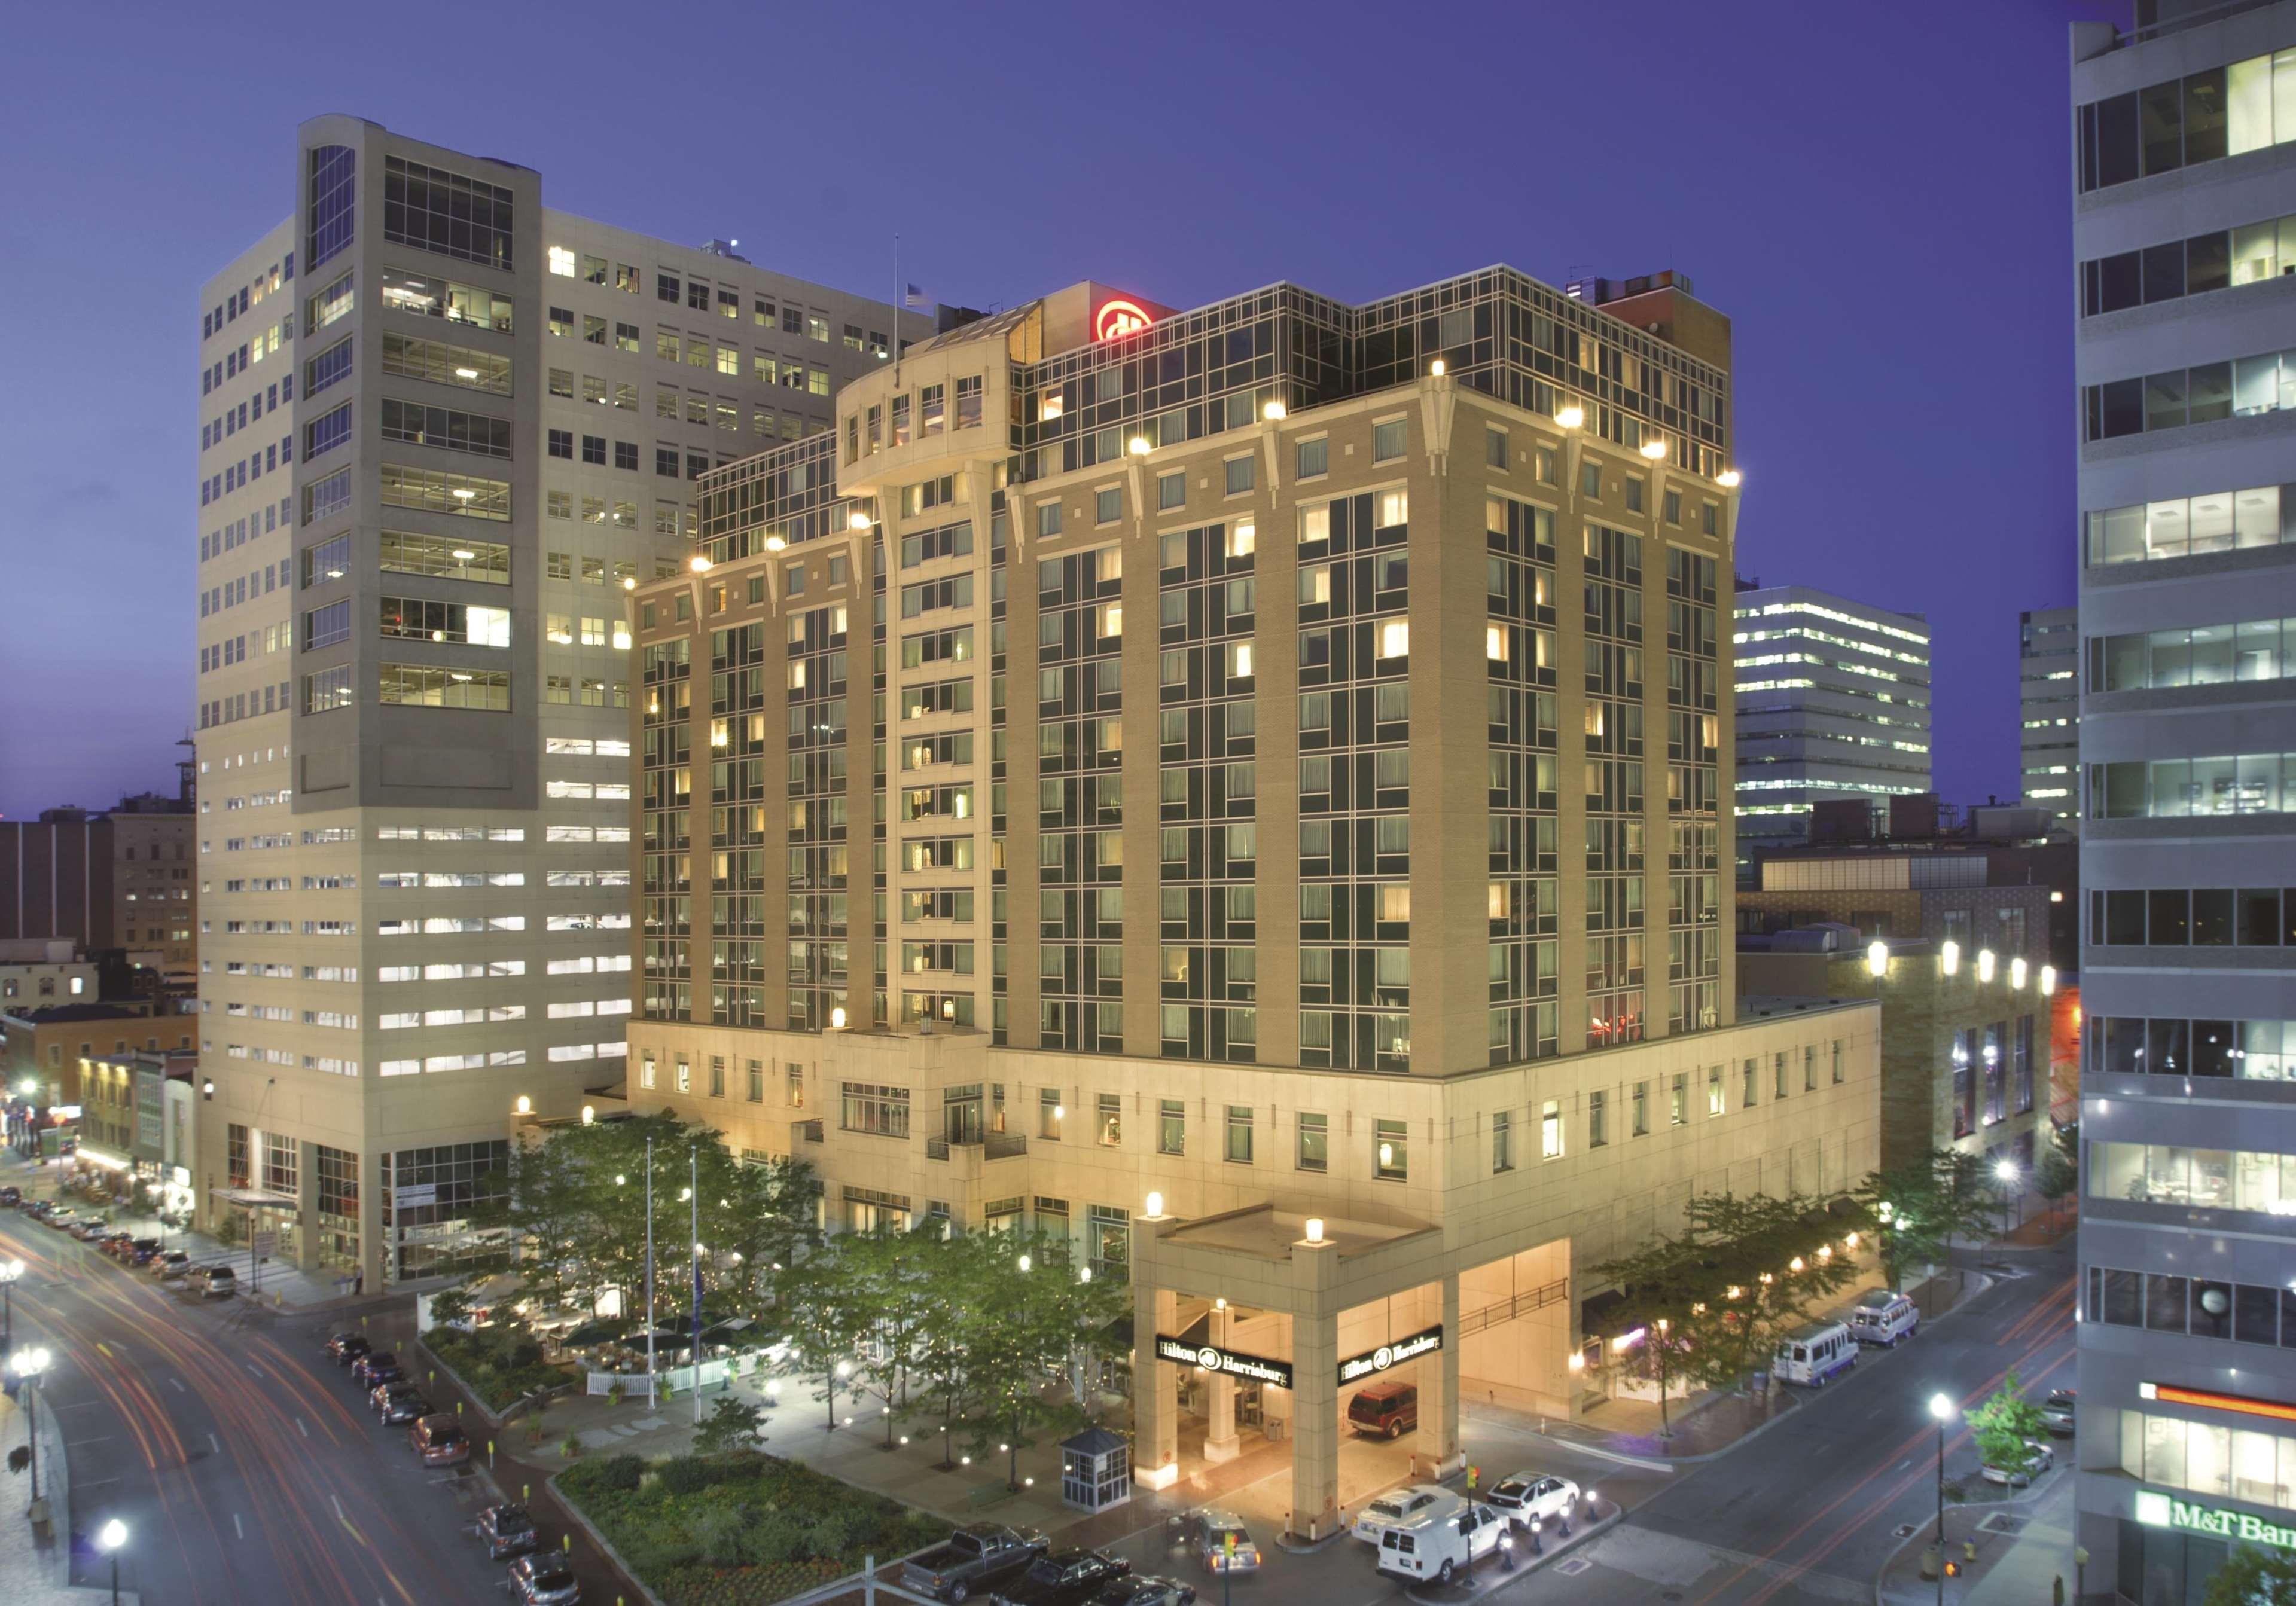 Hilton Harrisburg image 0